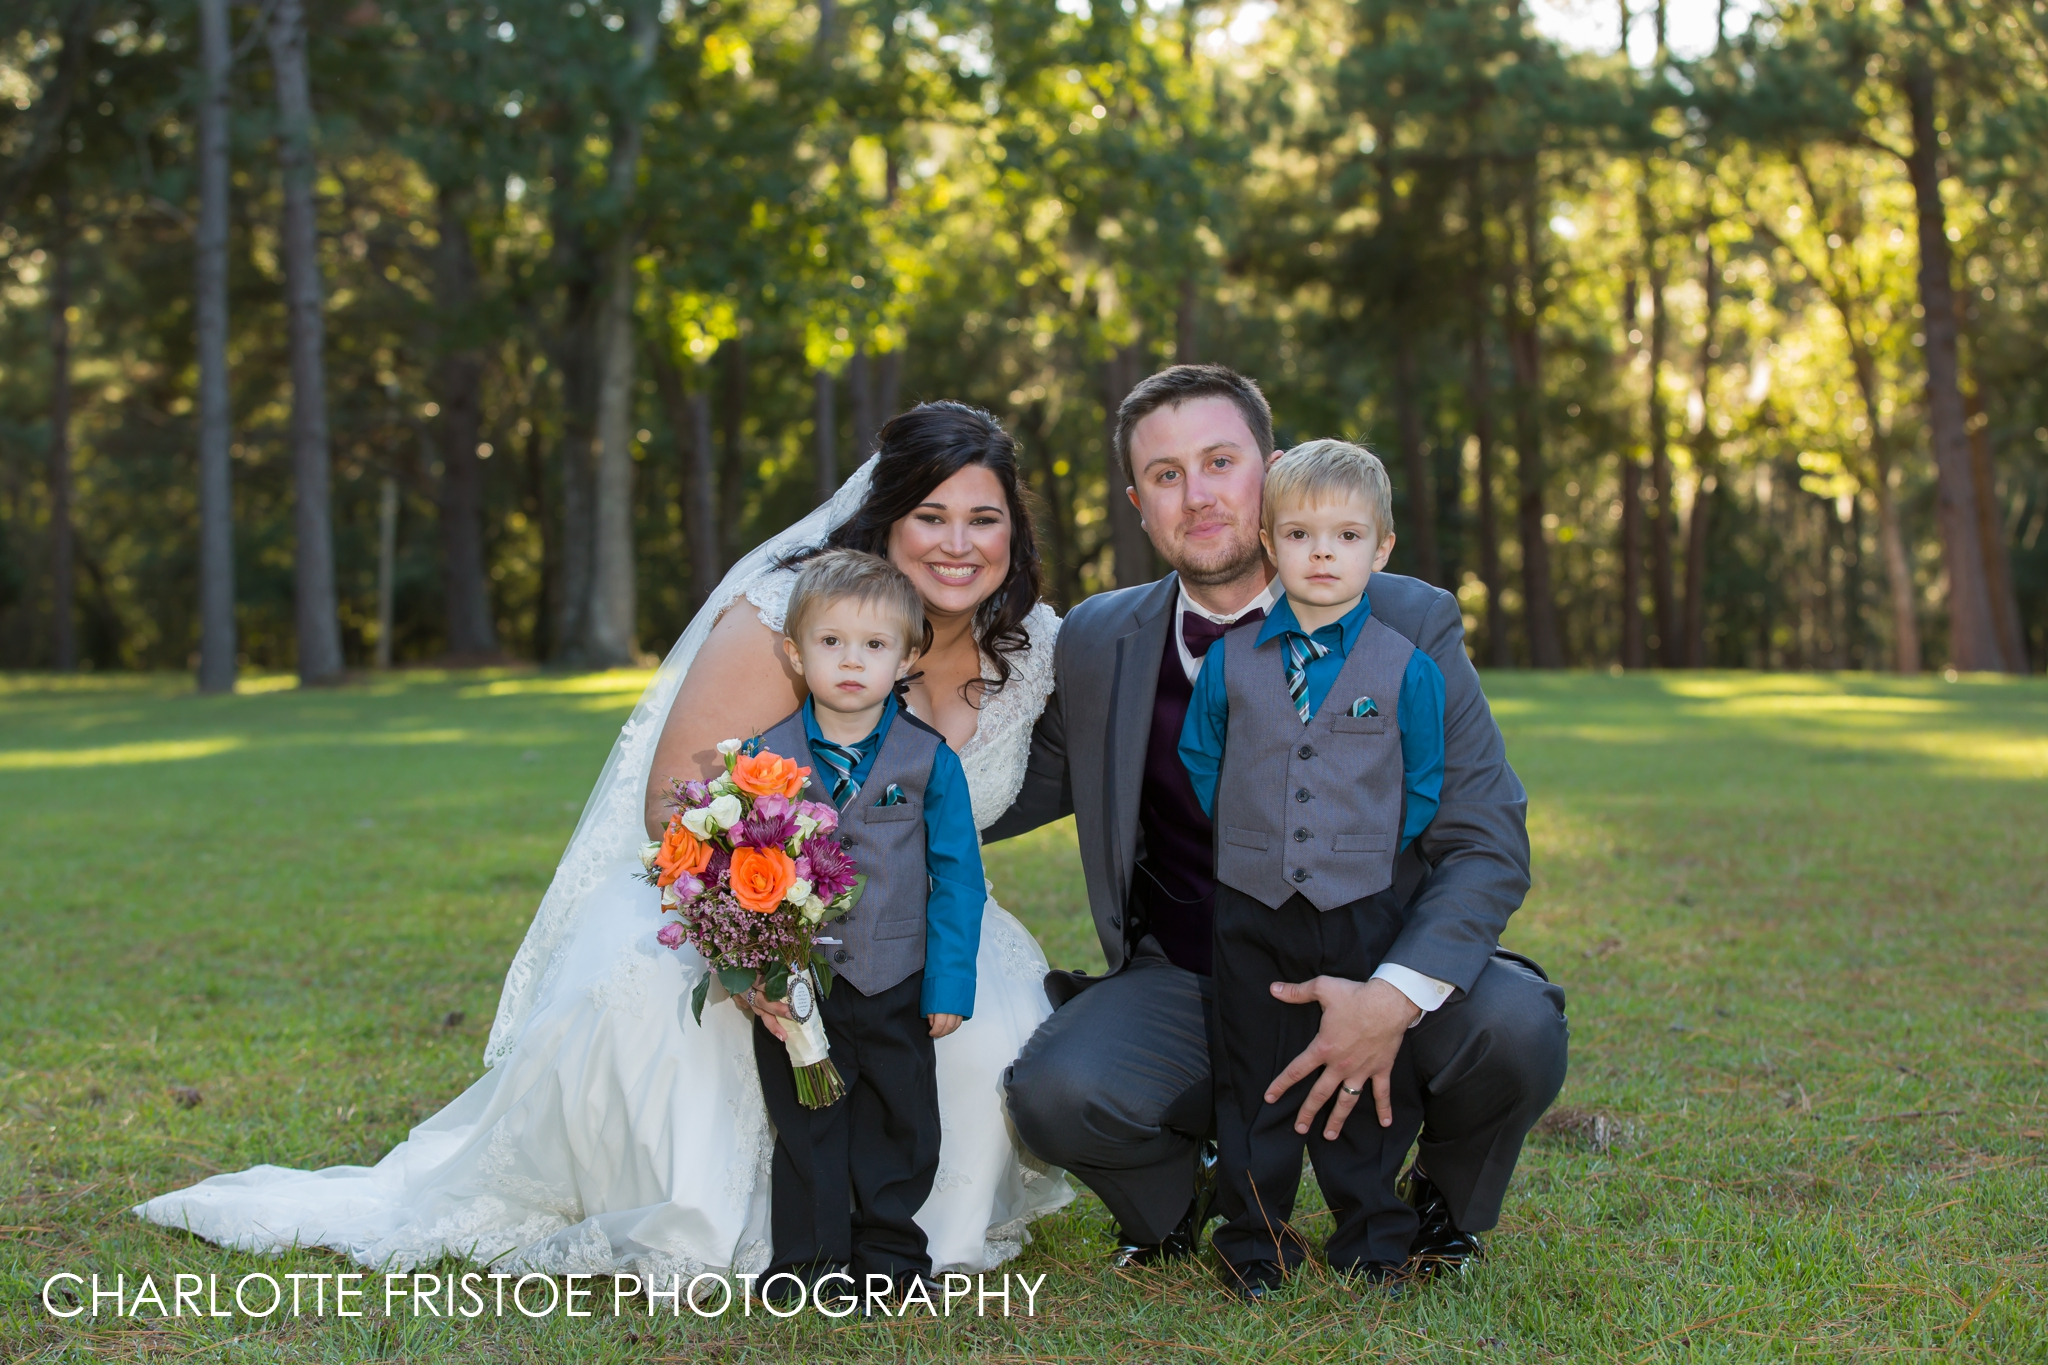 Lake Iamonia Wedding Charlotte Fristoe Photography-55.jpg